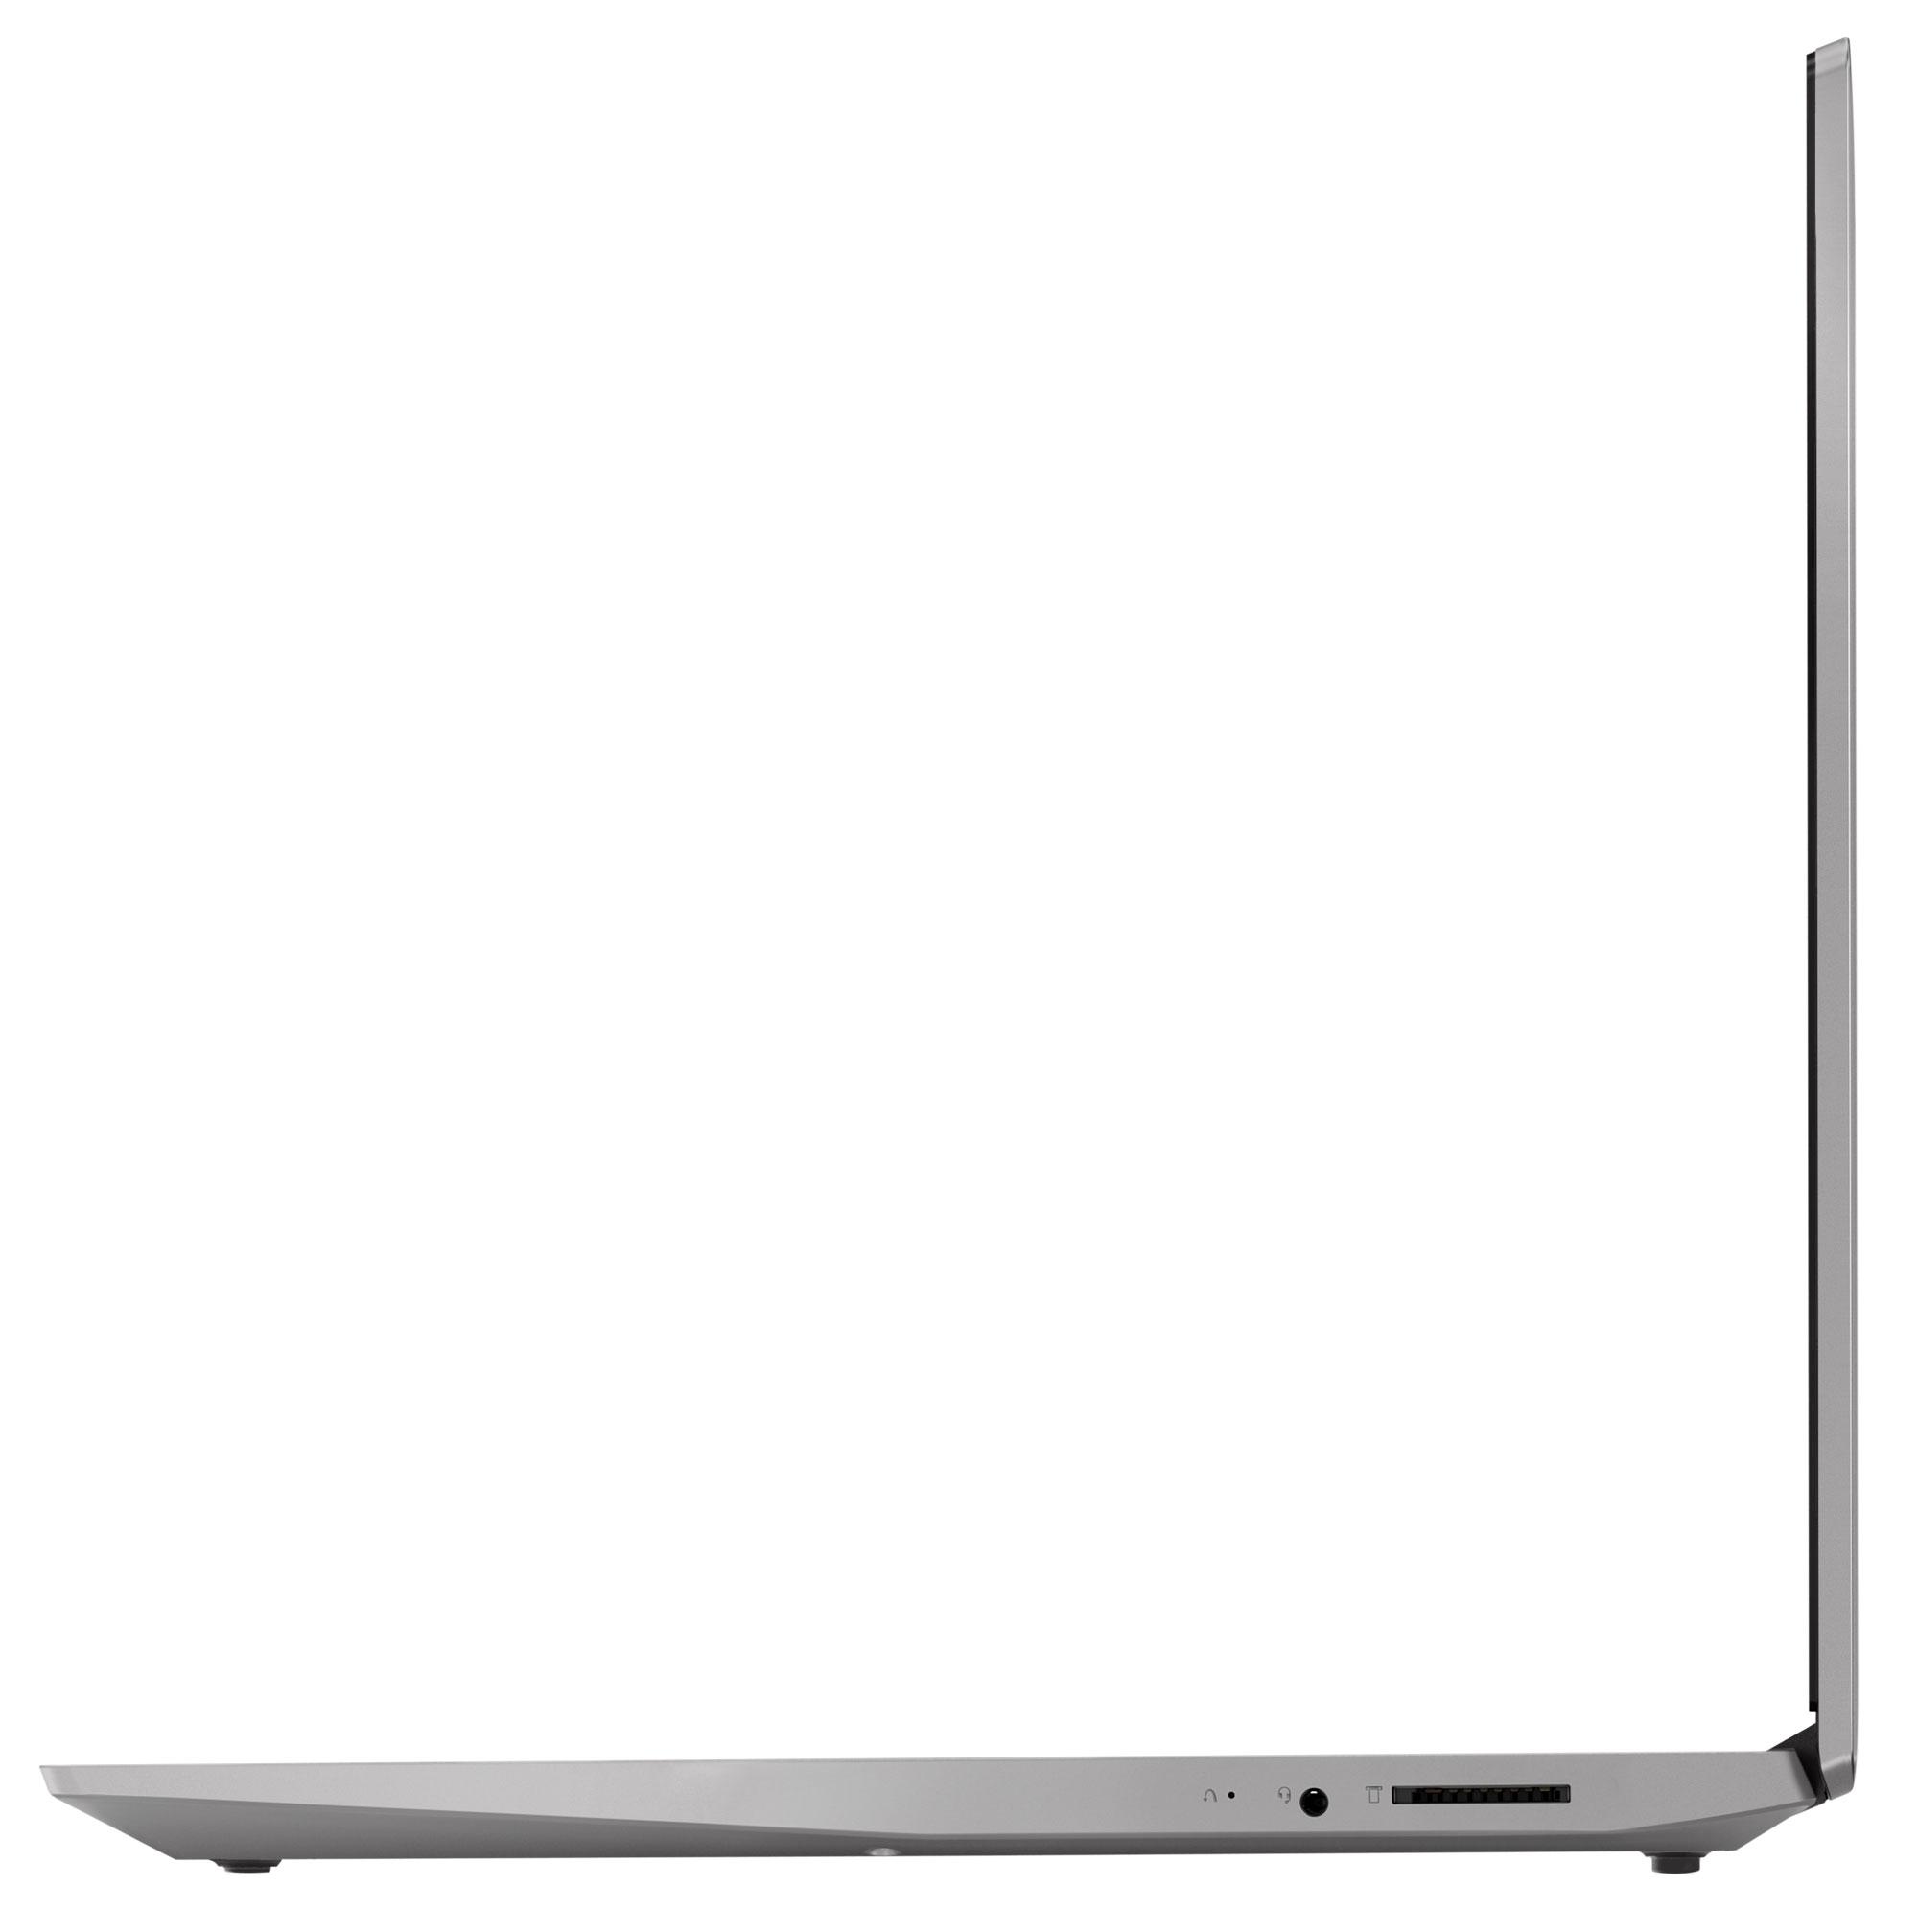 Фото  Ноутбук Lenovo ideapad S145-15IGM Grey  (81MX001JRE)